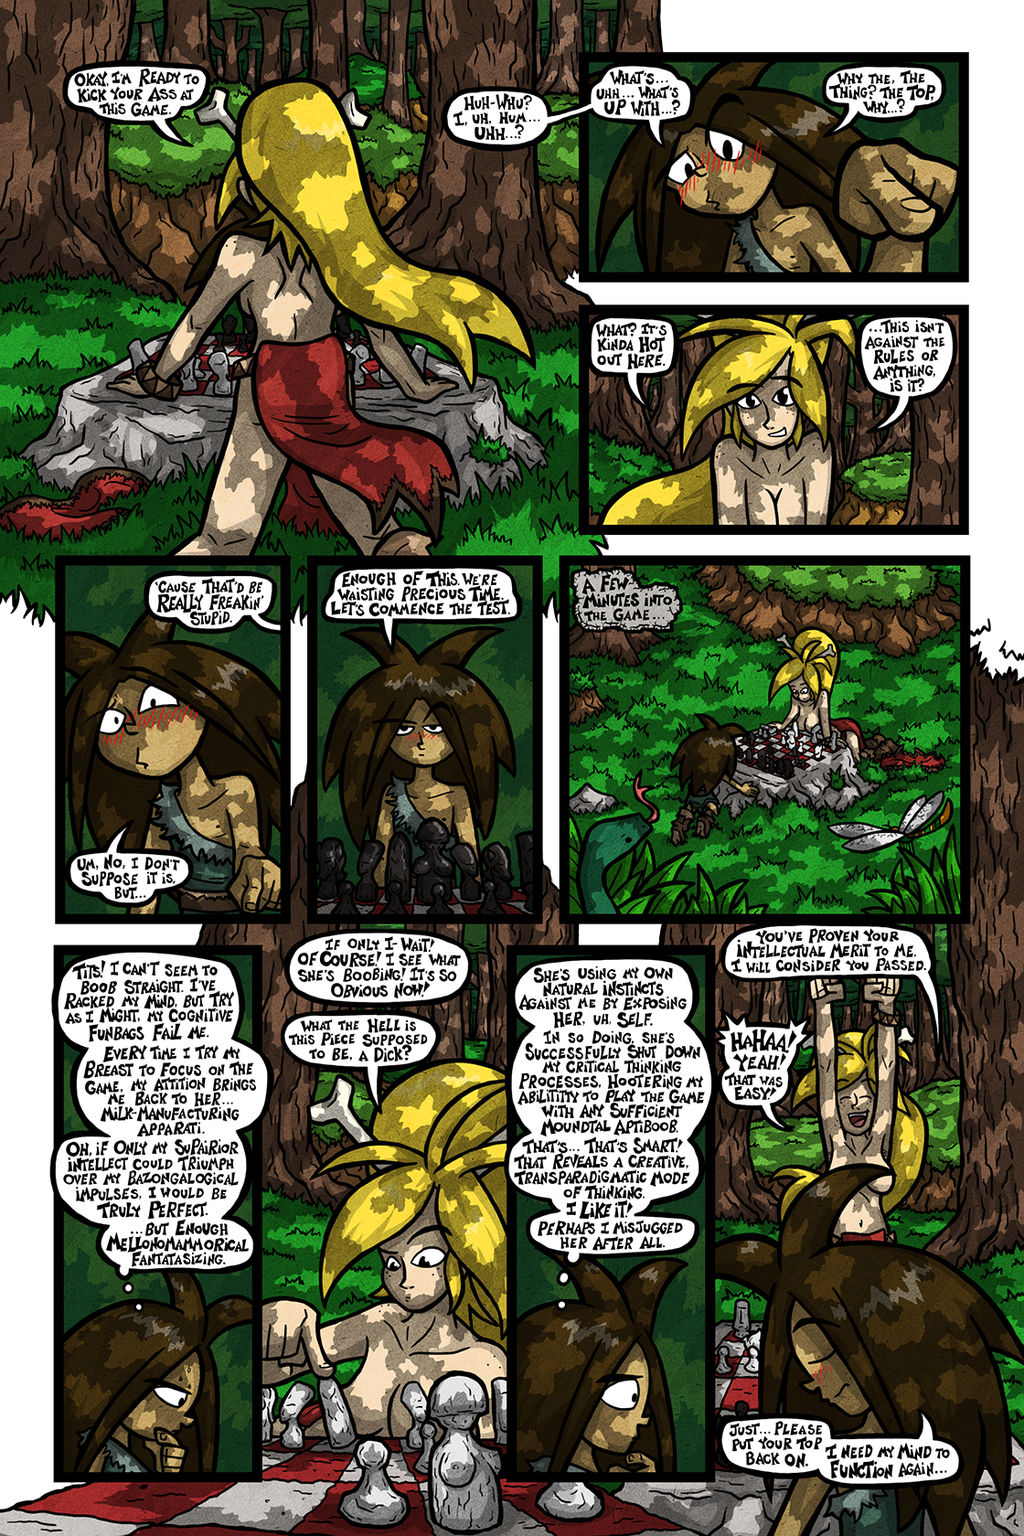 'Stone Punks' - Episode 1, Page 21